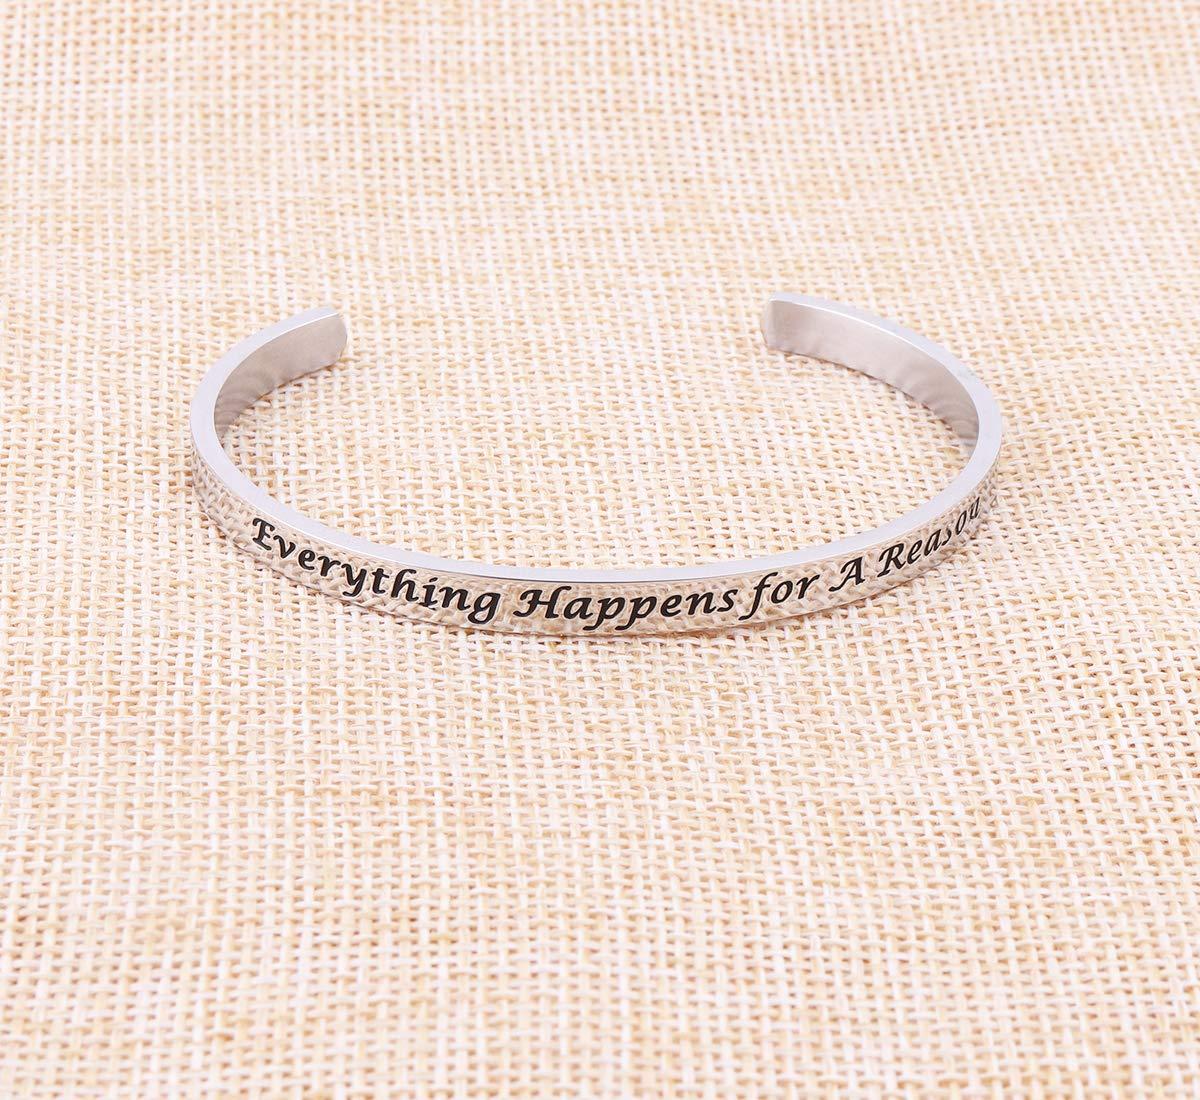 AZFEIYA Inspirational Bracelet Confidence Jewelry Motivational Cuff Bracelet Everything Happens for a Reason Encouragement Bracelet Personalized Birthday Gift (Silver Bracelet) by AZFEIYA (Image #3)